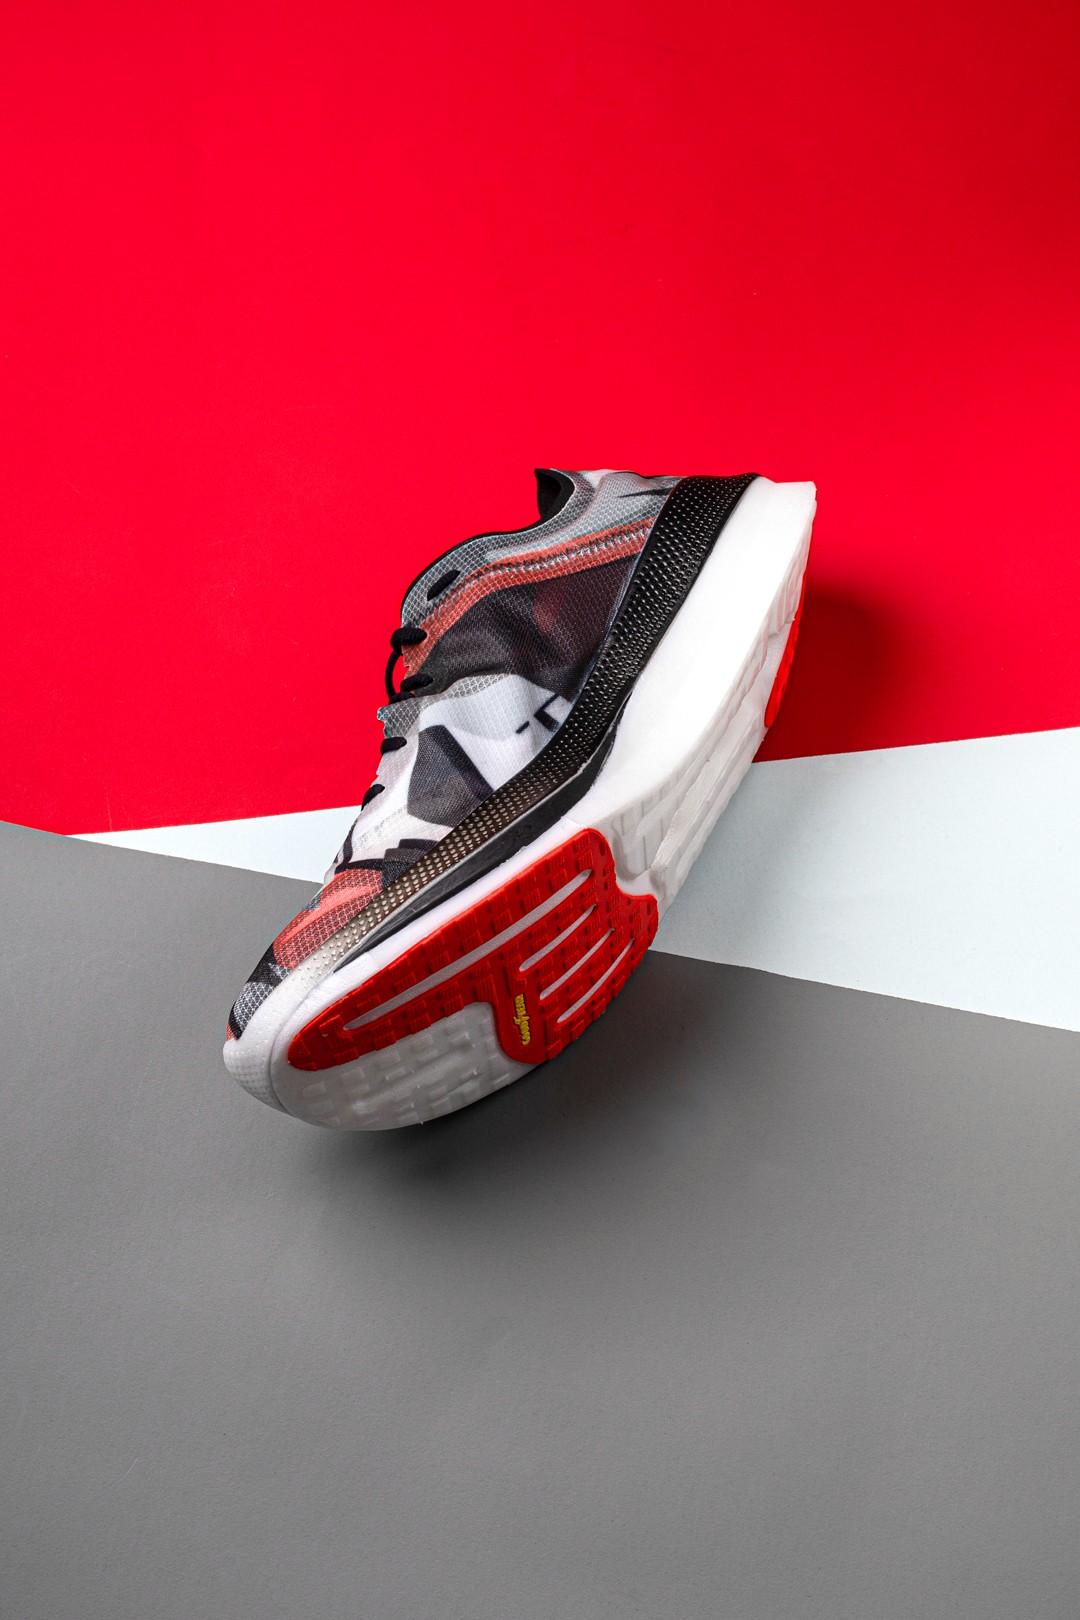 SKECHERS,SPEED FREEK,飞客  超大碳板 + 双层缓震!全新「顶配跑鞋」悄悄上架!